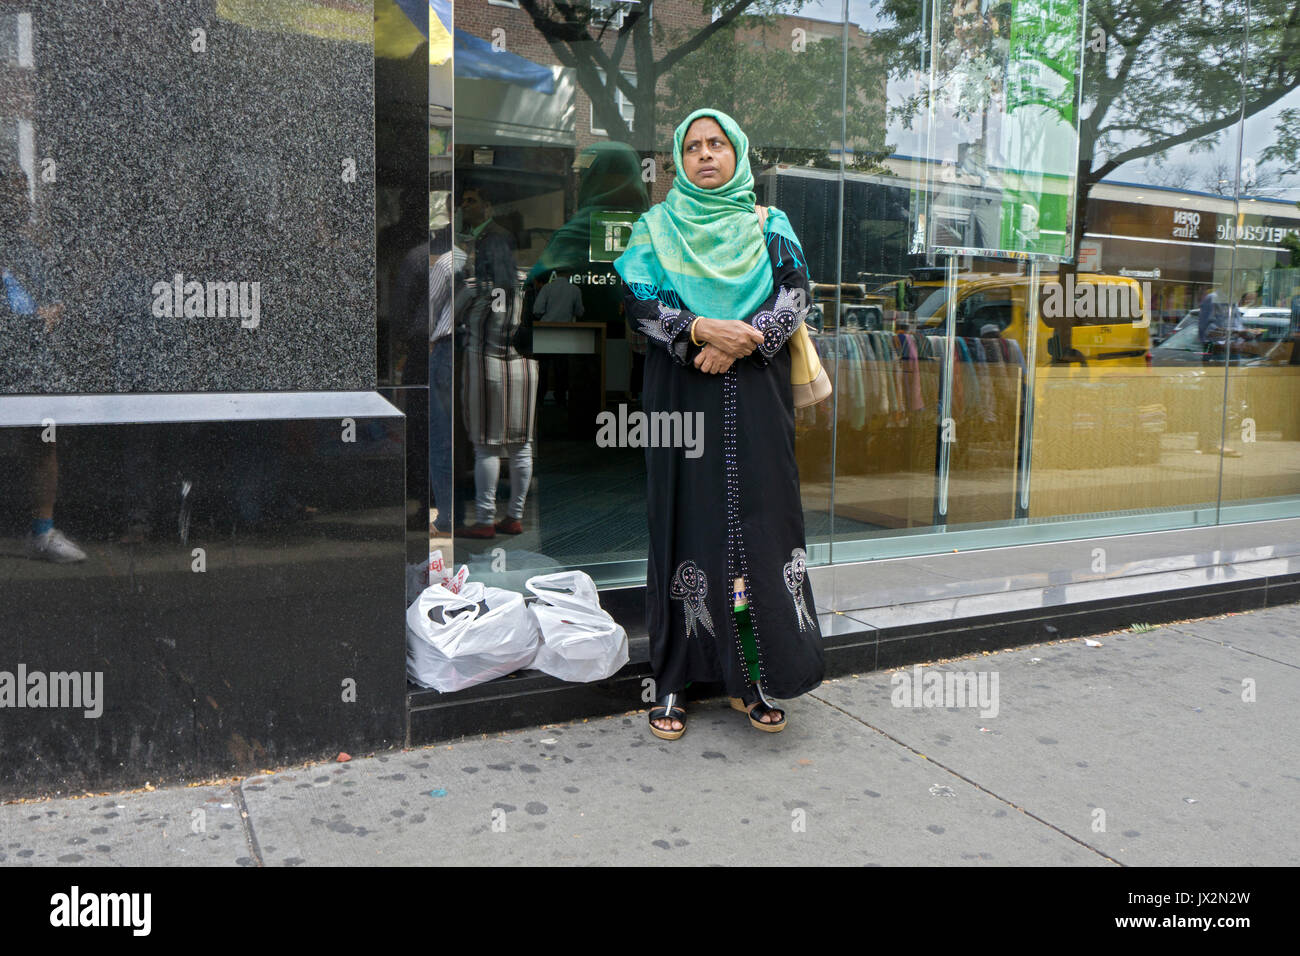 muslim single women in queen city Muslim matrimonial, muslim marriage, muslim  qirancom - _saeed_ - muslim matrimonial, muslim marriage, muslim singles you  a wife who i can make my queen.